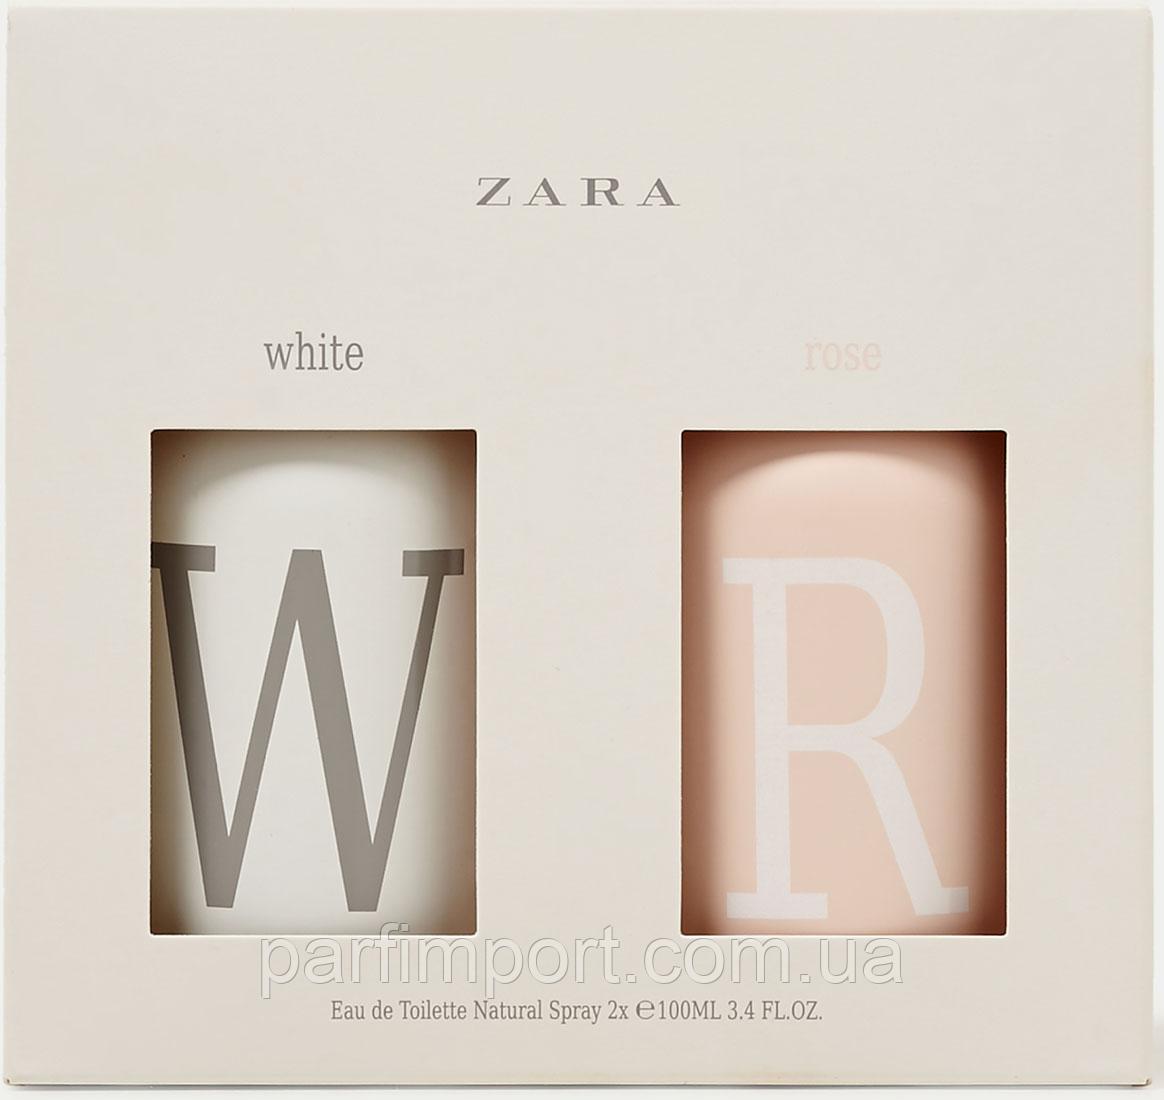 Zara White Rose 100ml 100ml туалетная вода женская оригинал